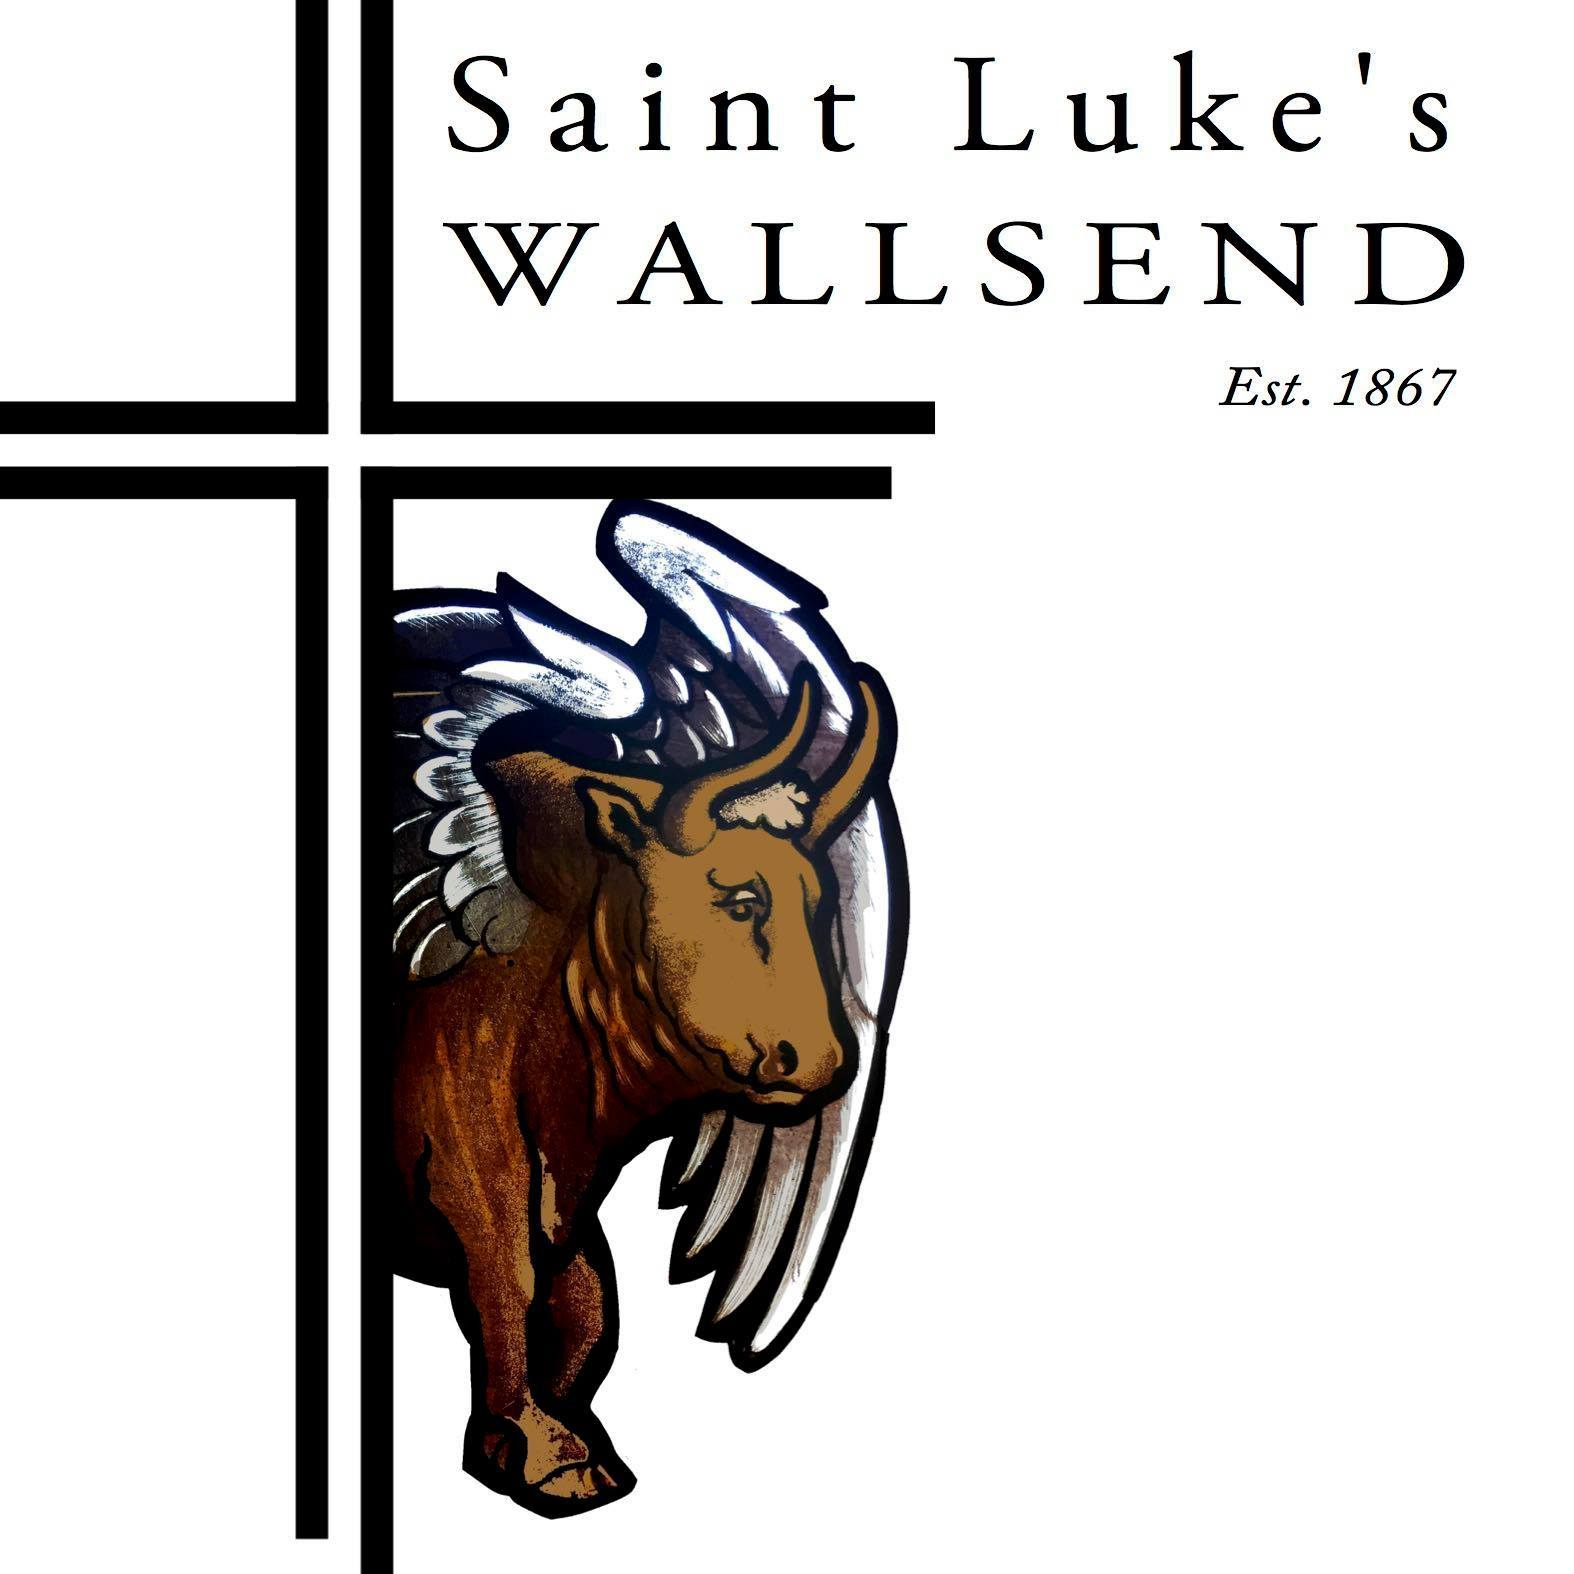 St Luke's Wallsend